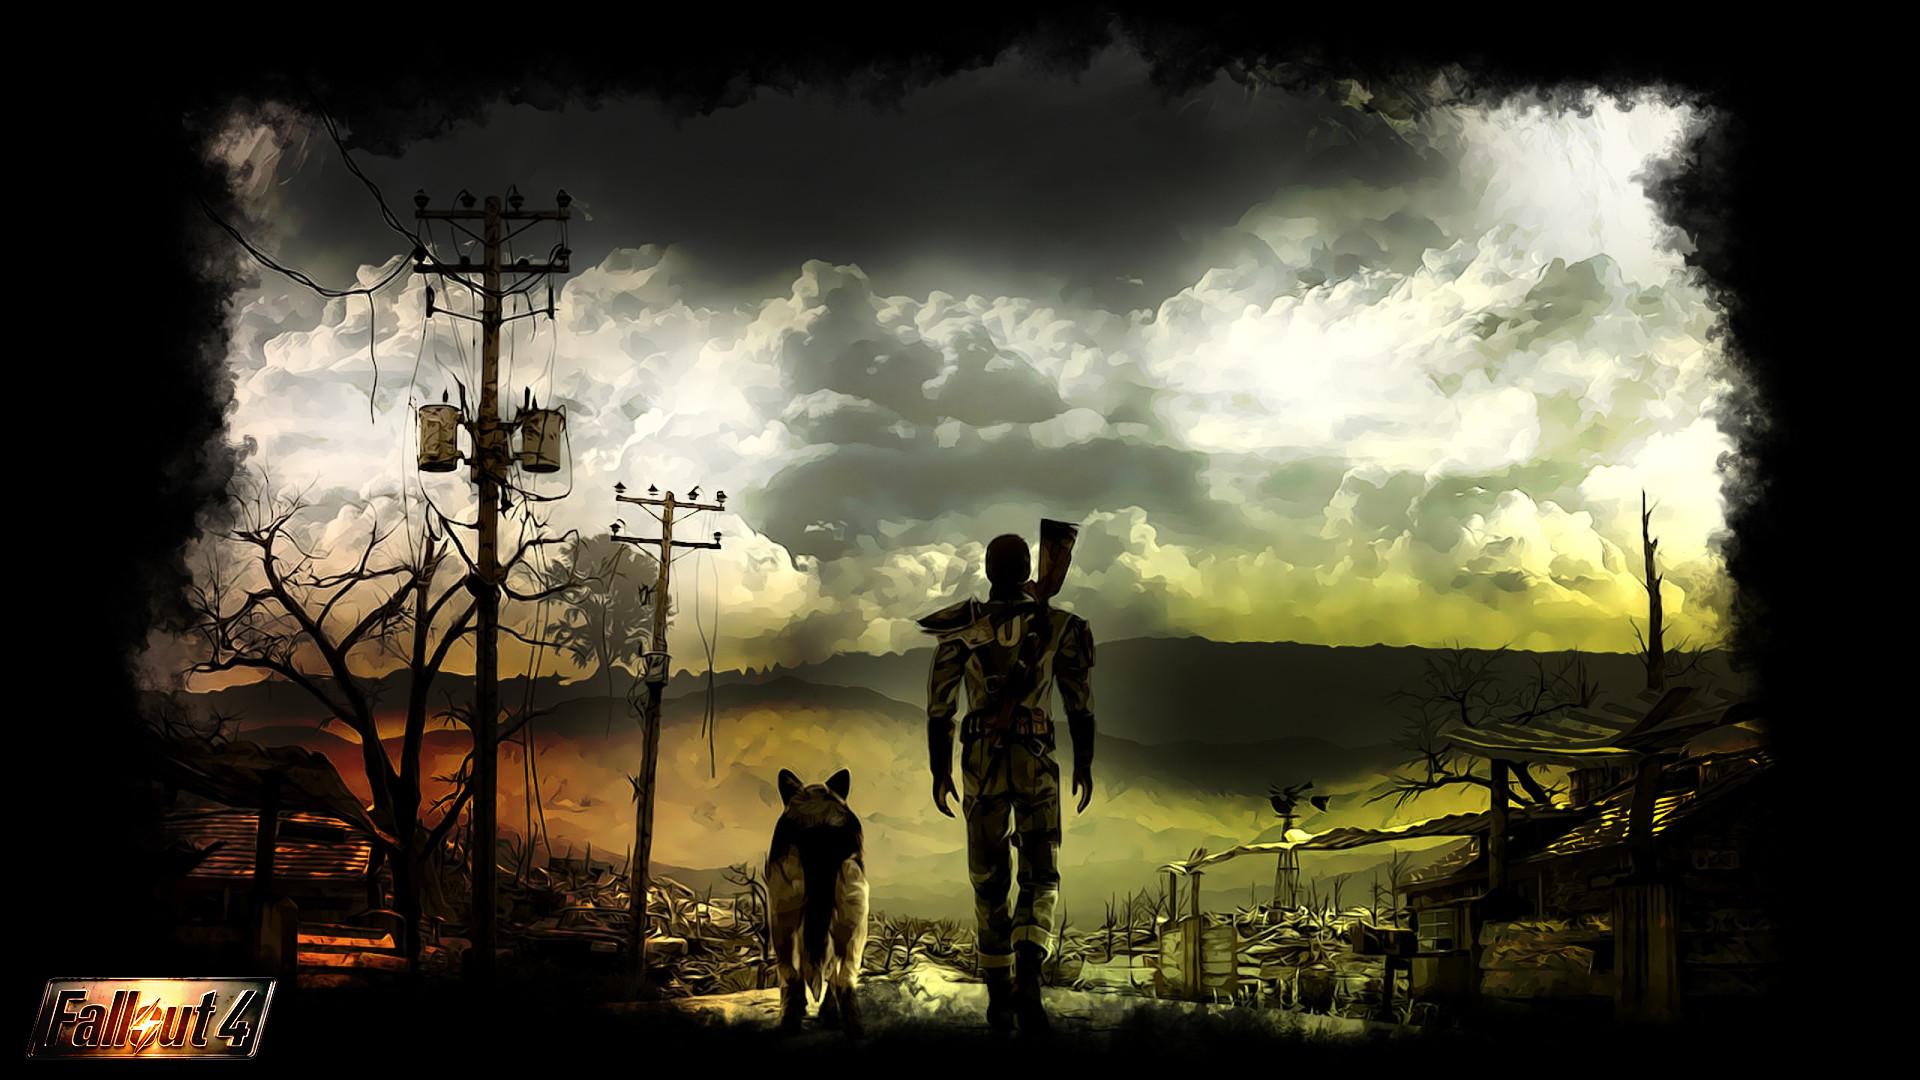 <b>Wallpaper Fallout 4</b> – <b>Fallout 4